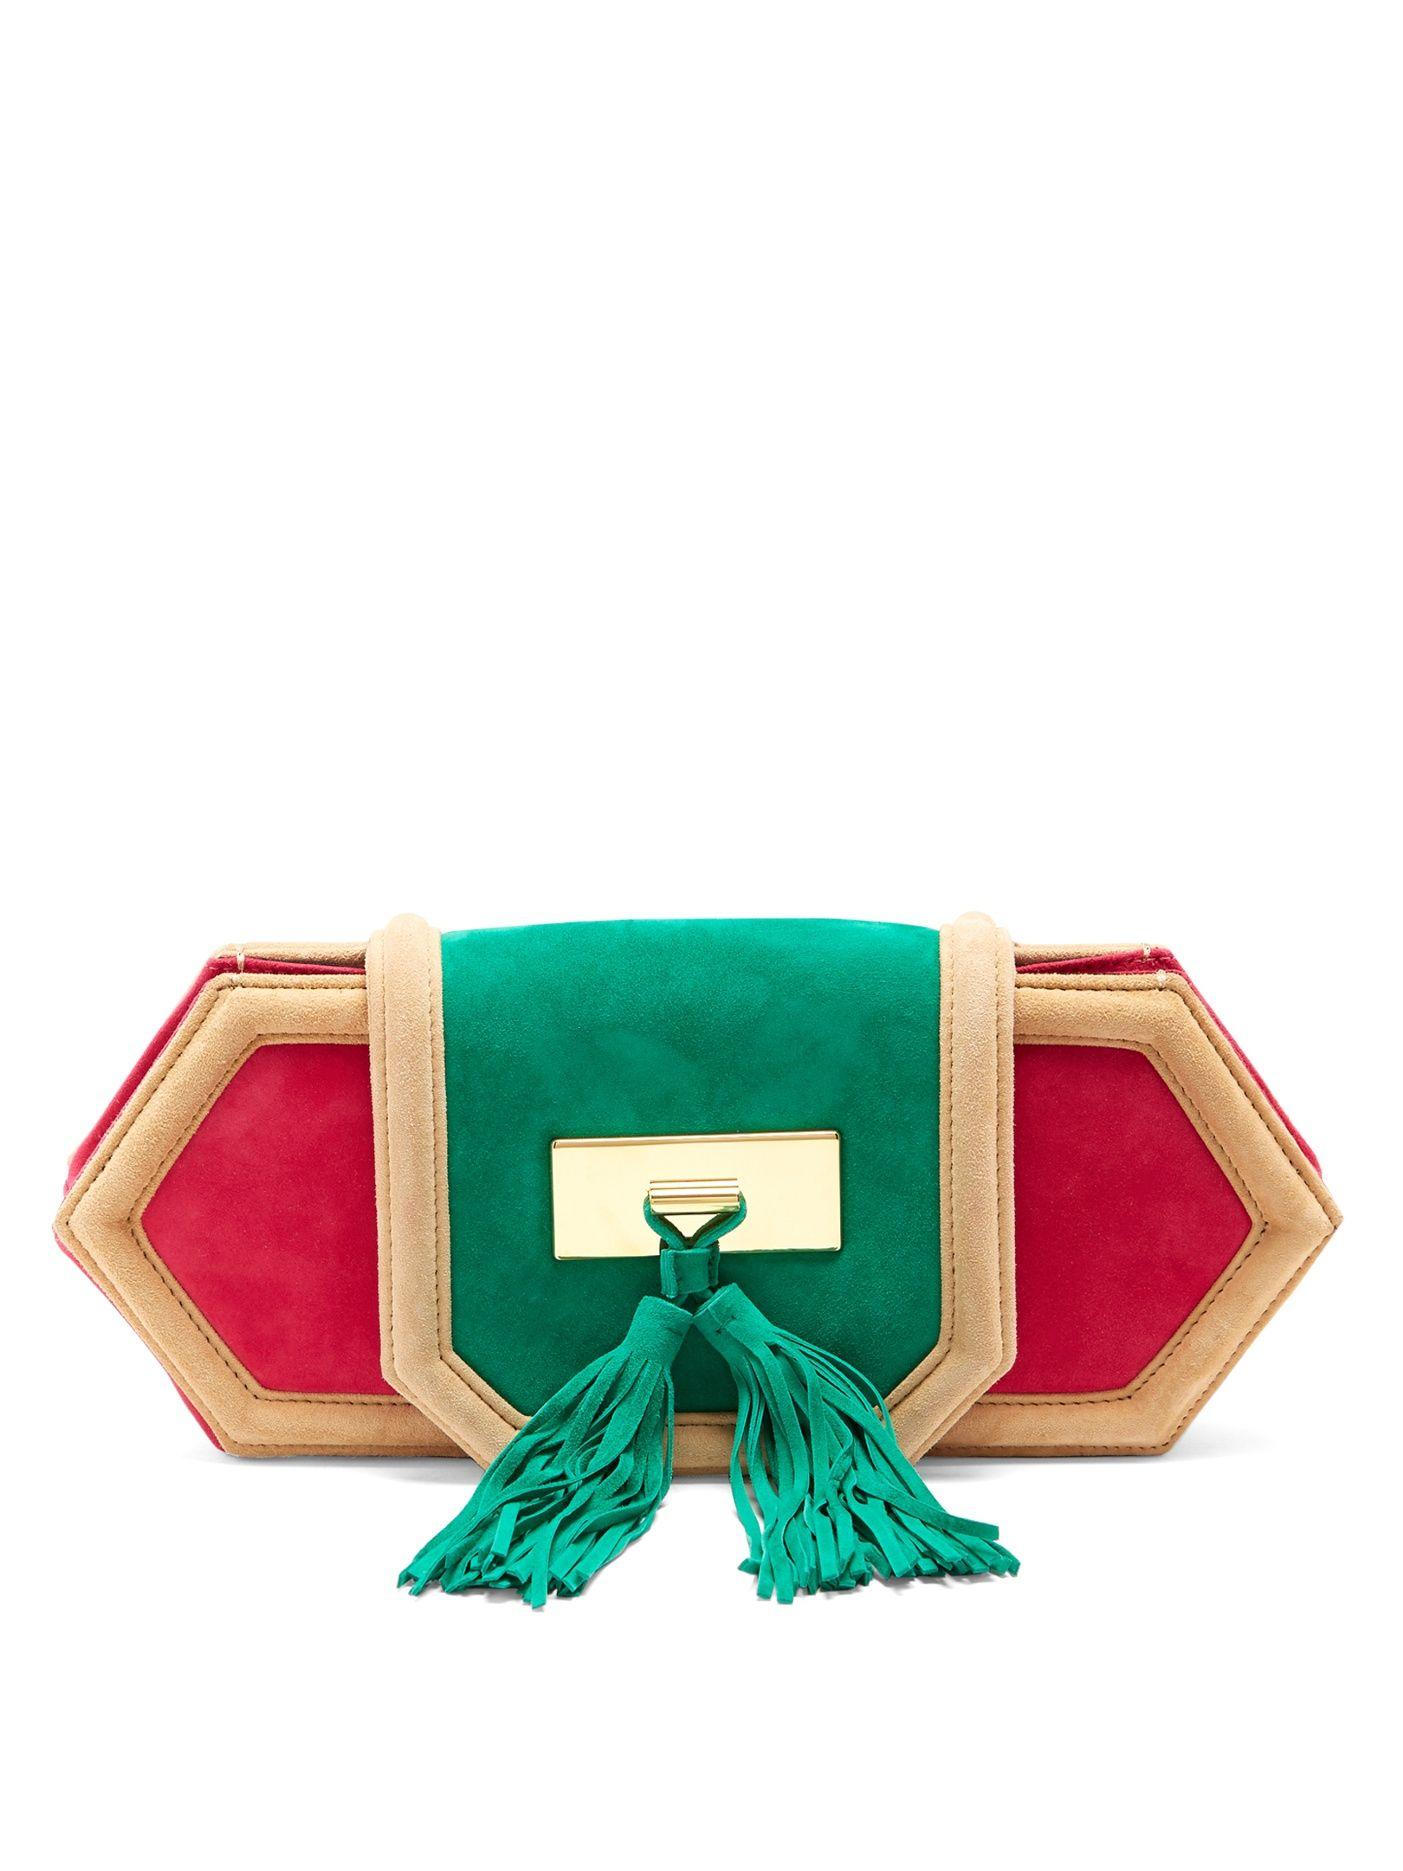 39f6c8000ee Killari tassel-embellished suede clutch   Balmain   MATCHESFASHION.COM US